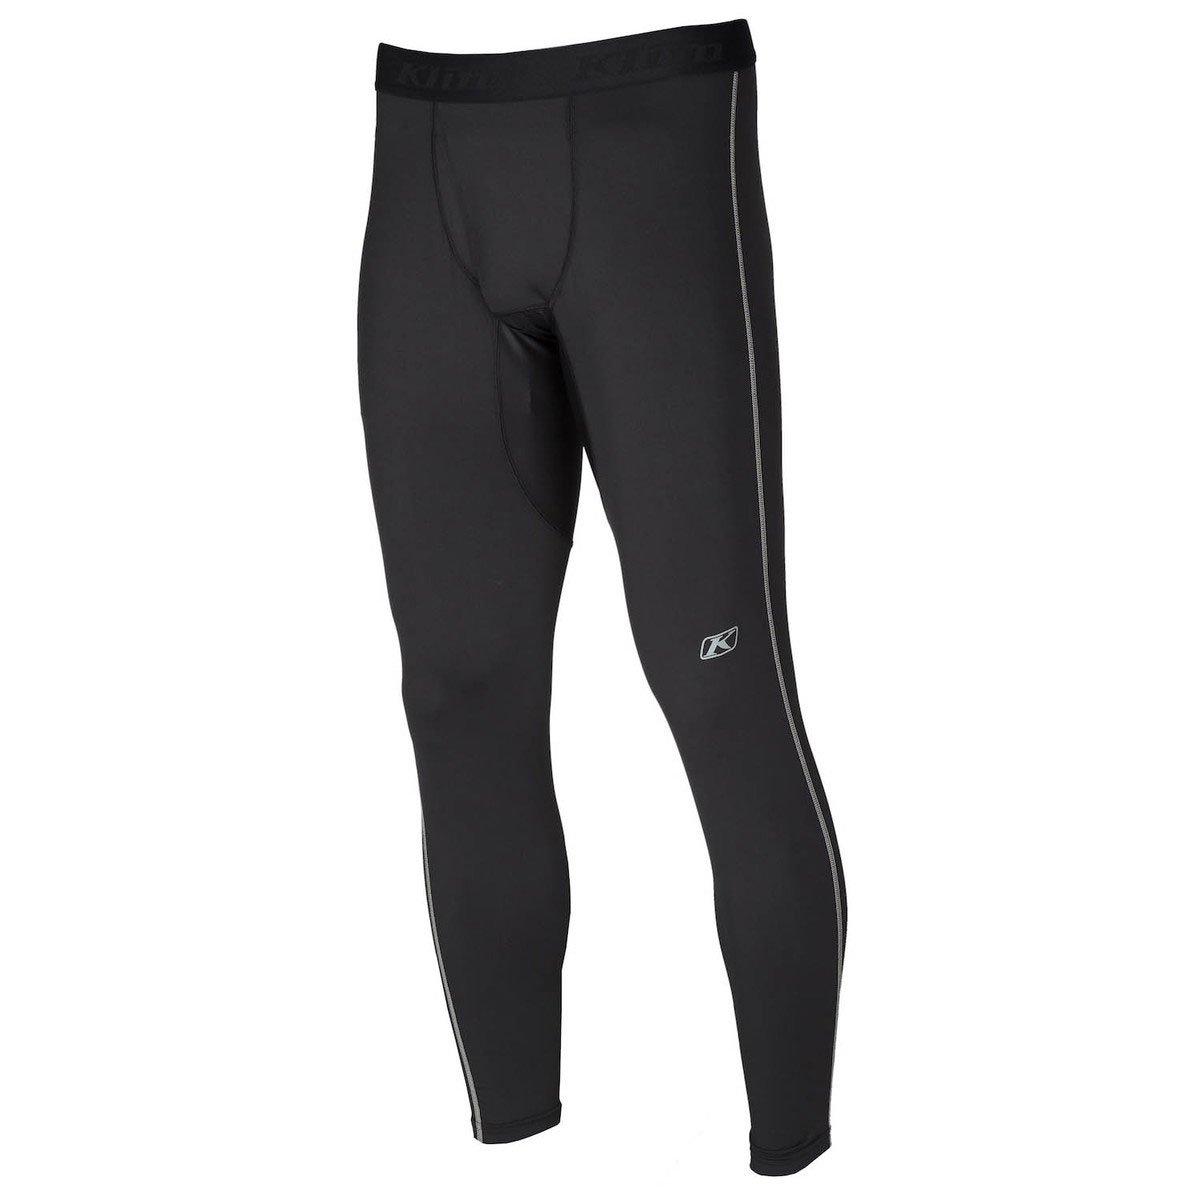 Klim Aggressor 1.0 Pants Mens Undergarment